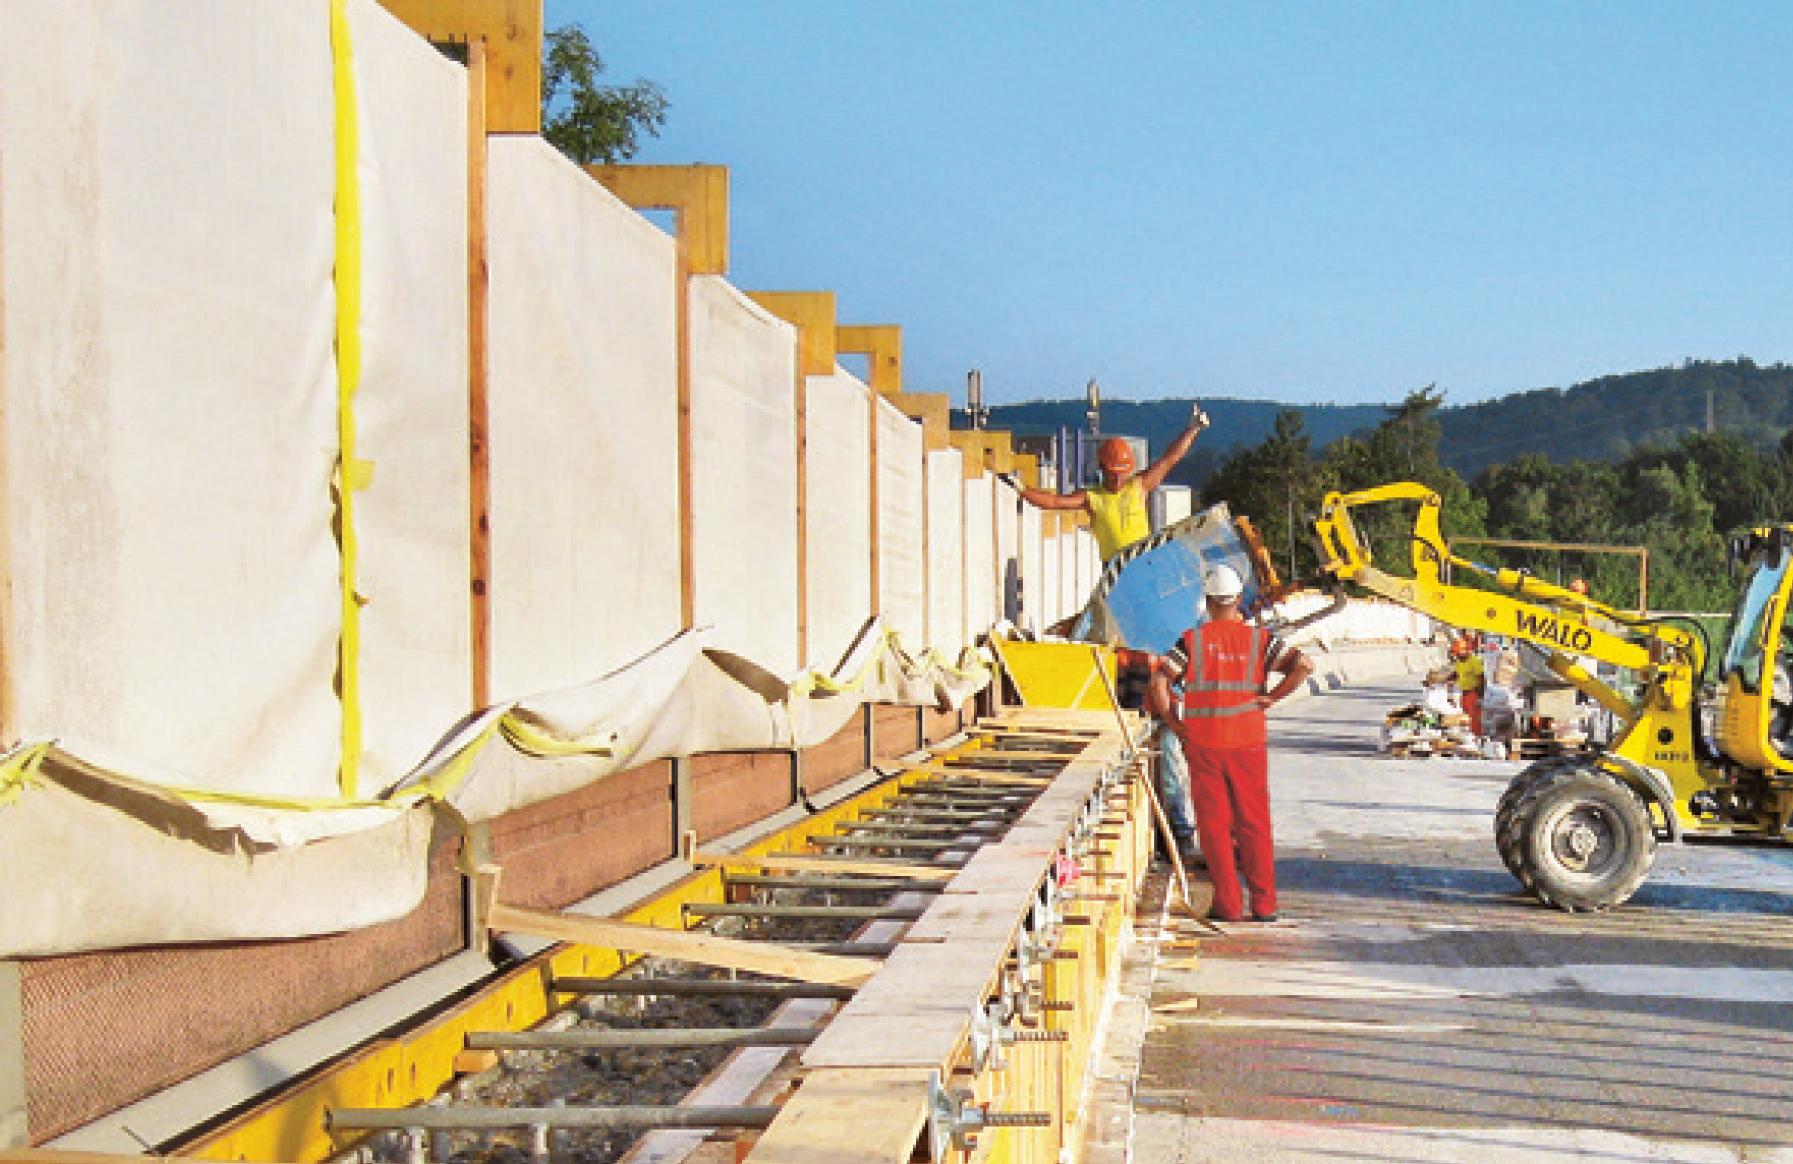 Ultra High Performance Concrete and Bridge Rehabilitation Innovation